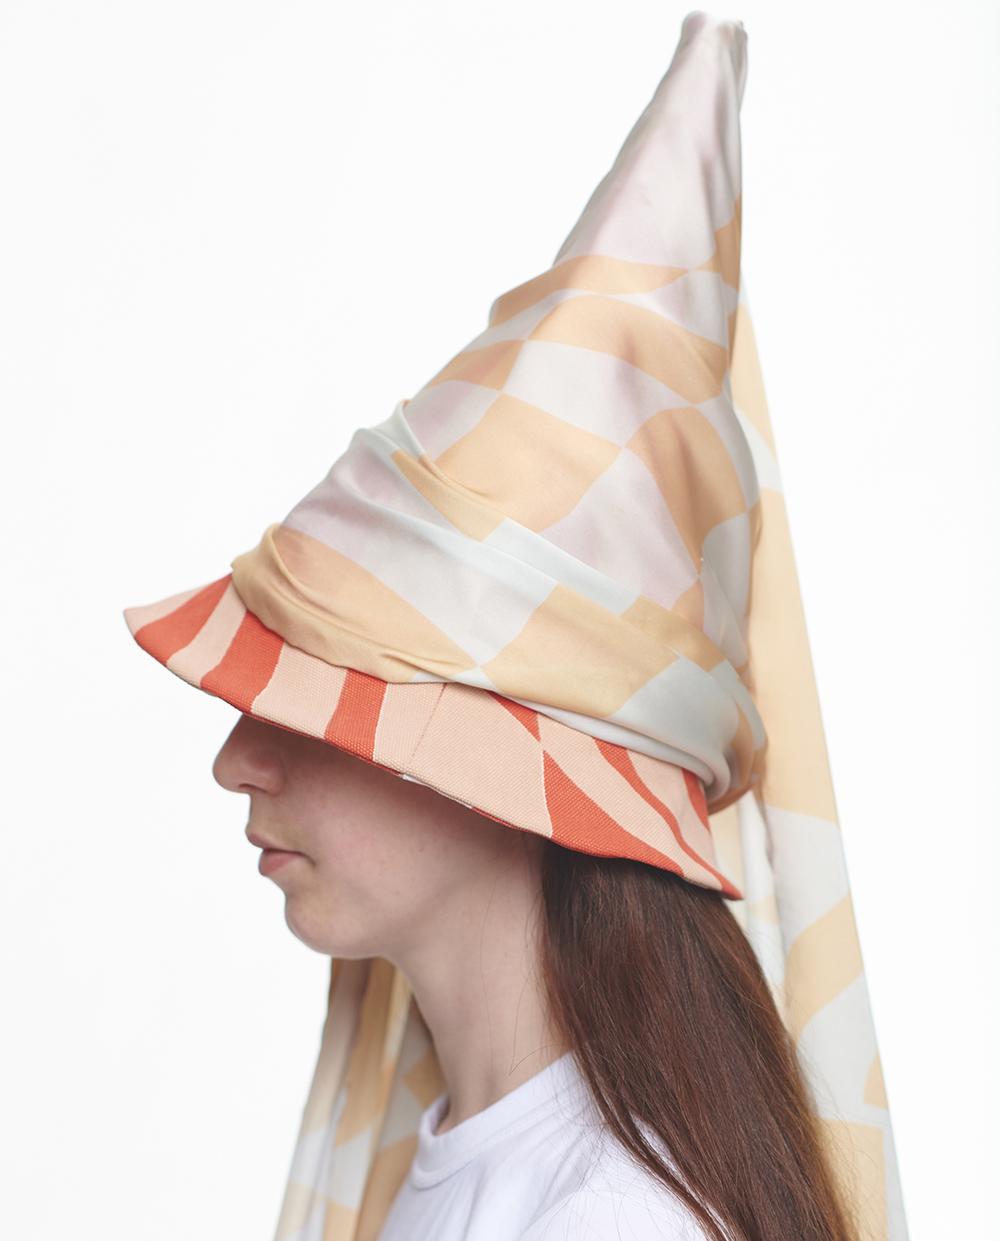 Fiona O'Neil Studio Product Image